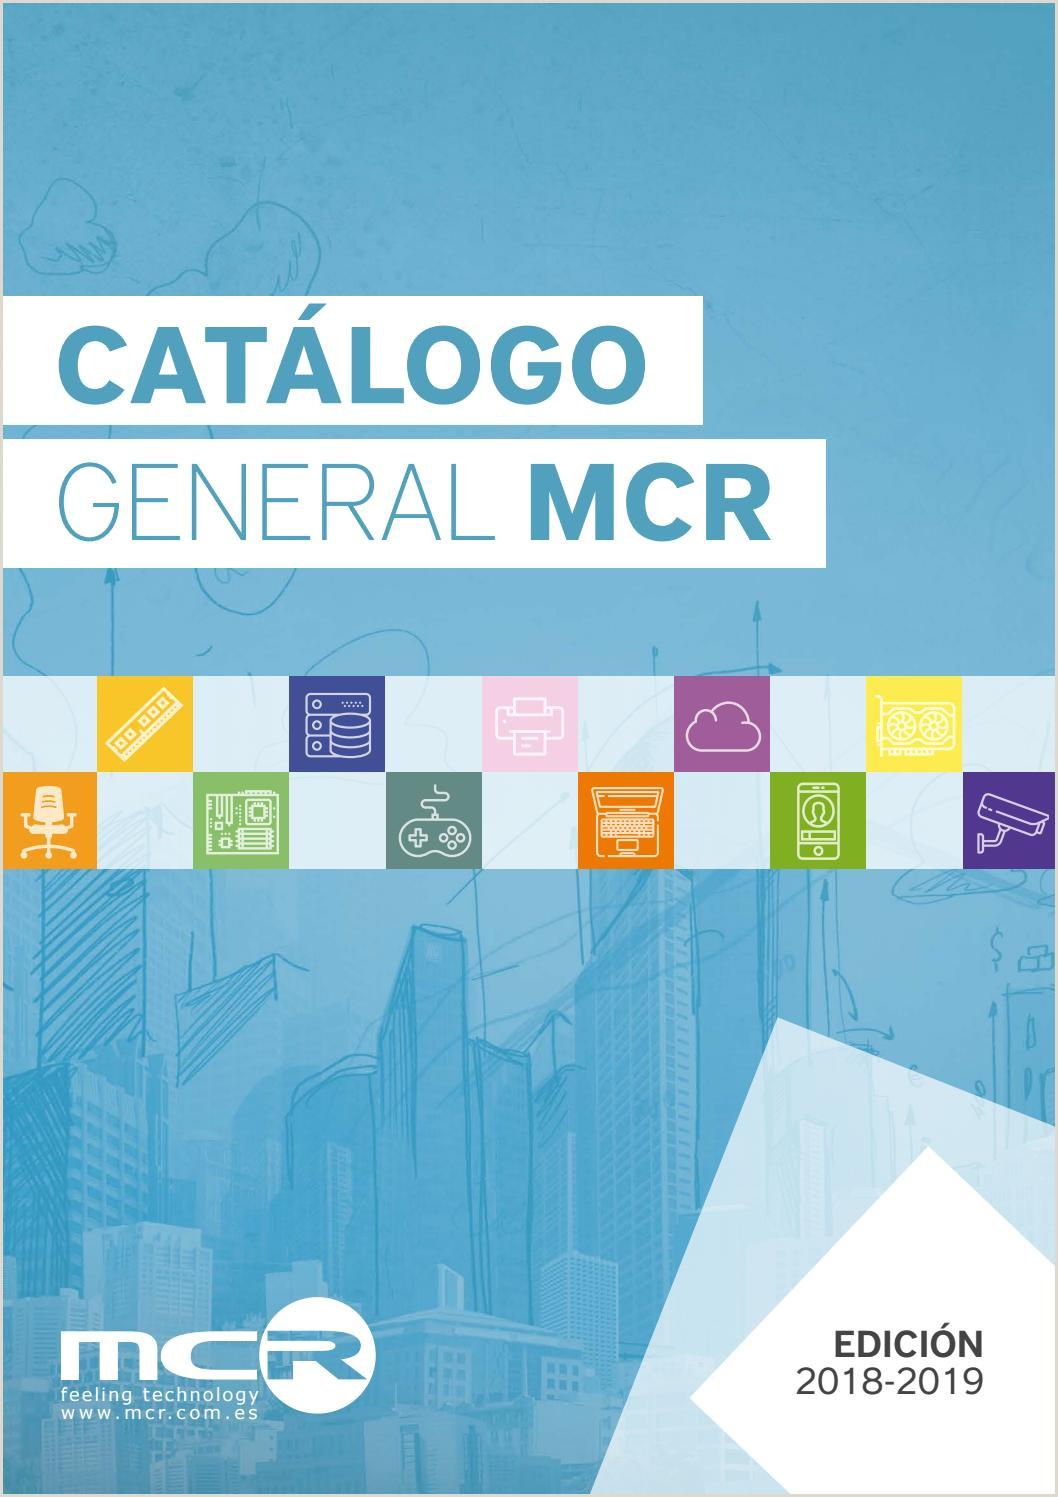 Formato Unico De Hoja De Vida Funcion Publica Modificable Catálogo General Mcr 2018 2019 By Mcr Infoelectronic Issuu